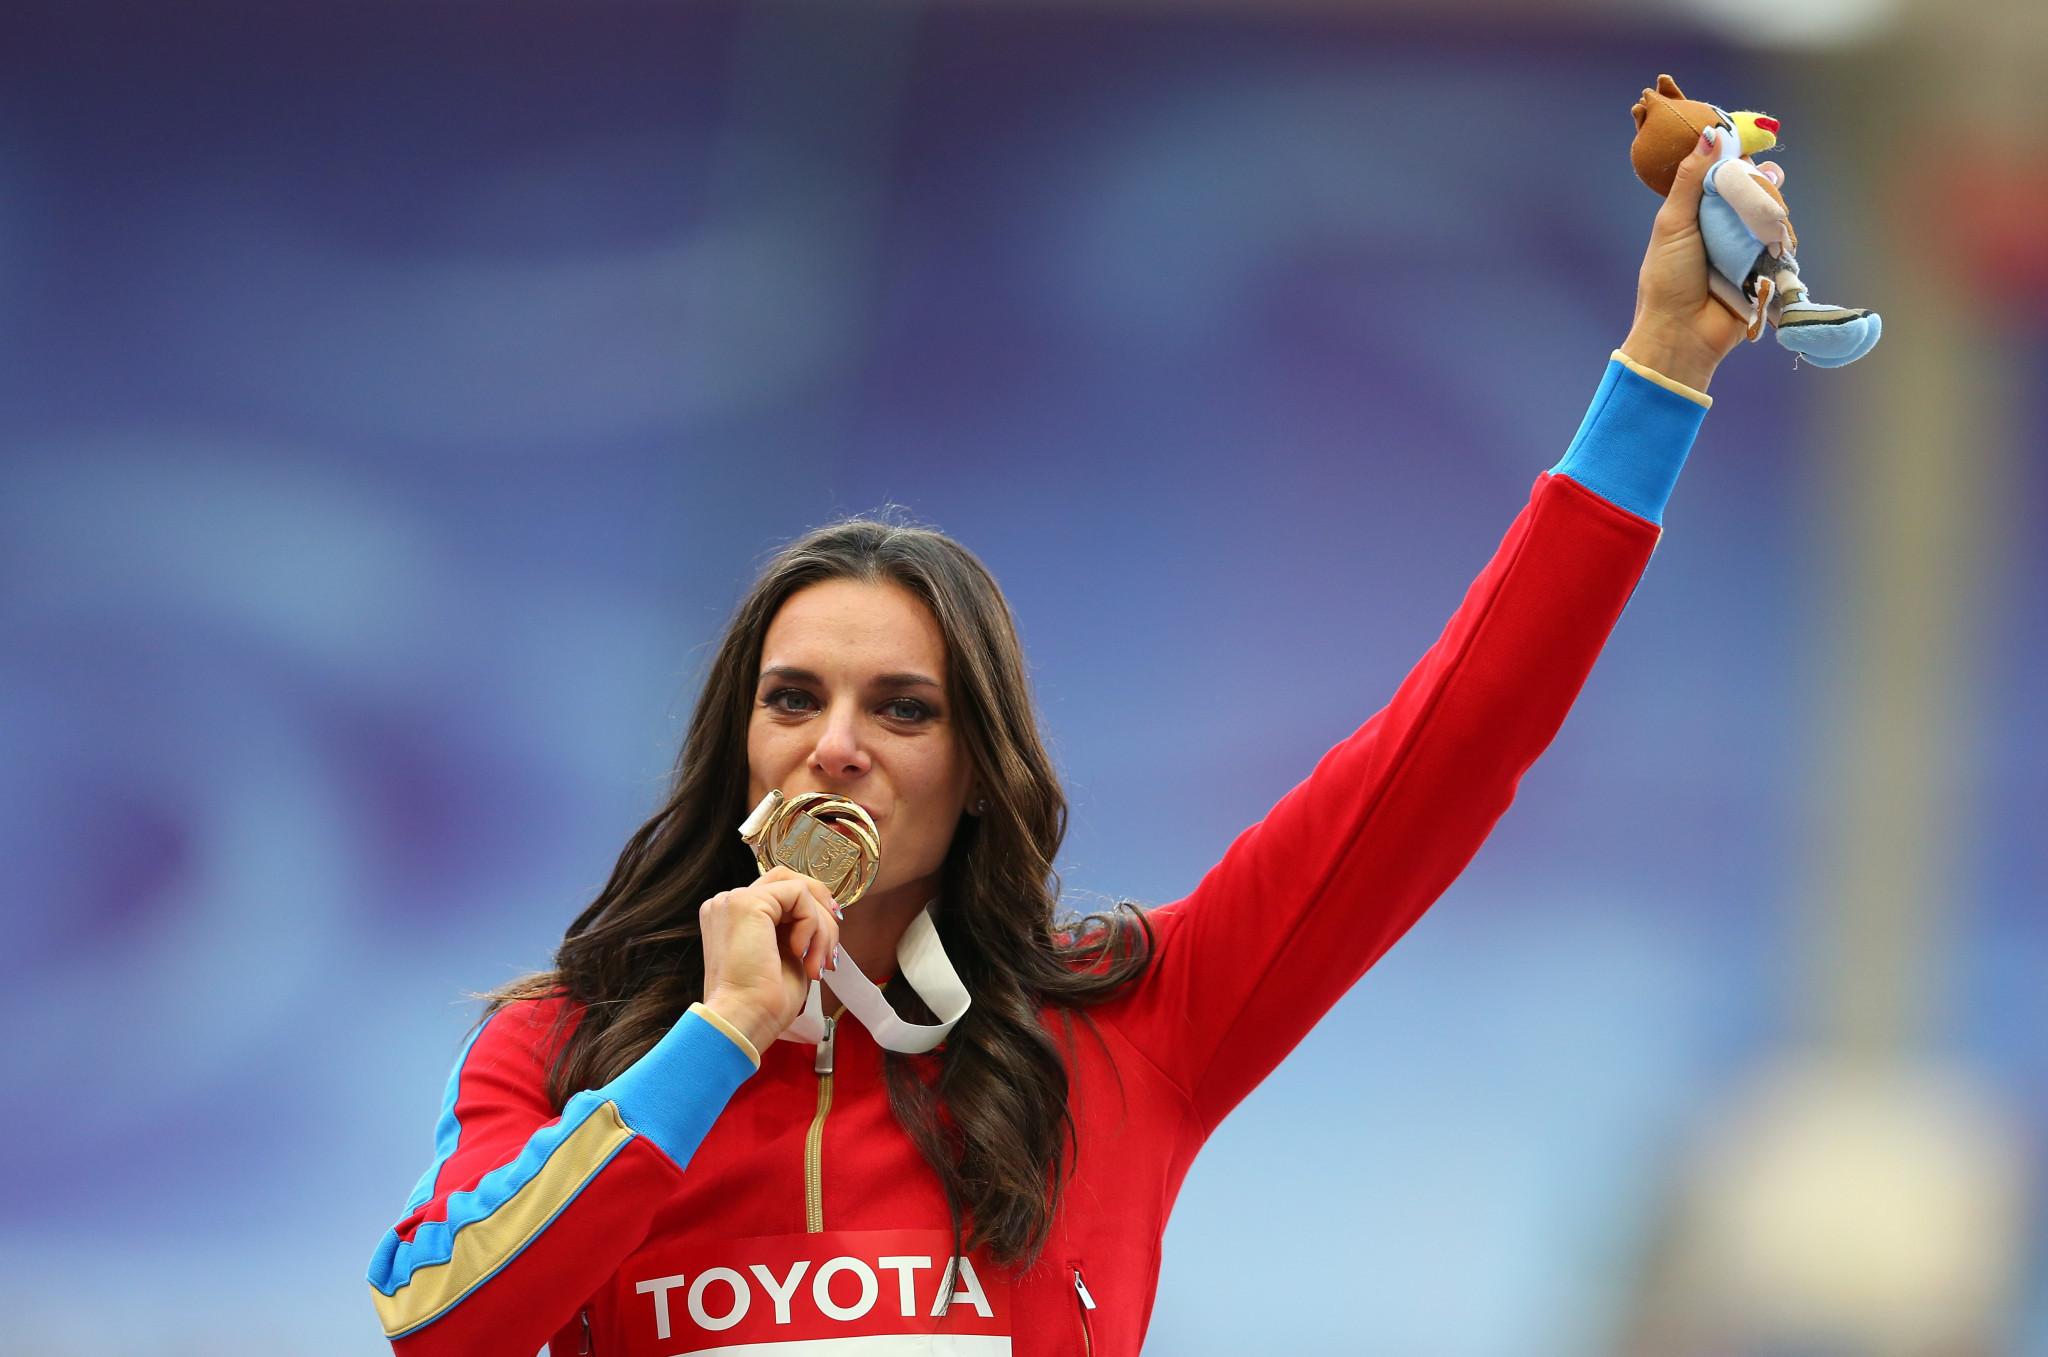 Isinbayeva disputes decision to split men's high jump gold at Tokyo 2020